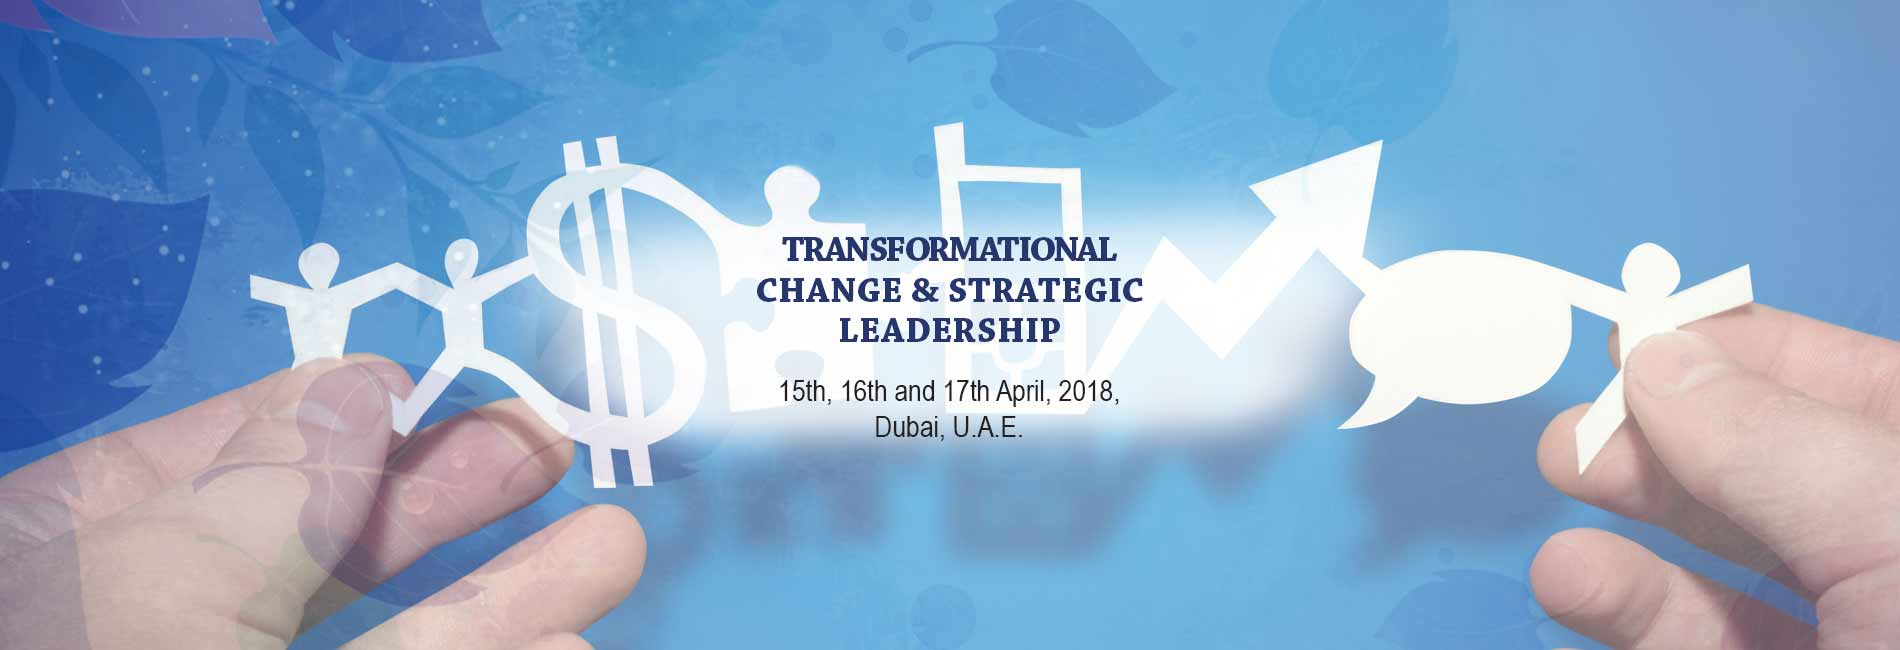 Transformational Change & Strategic Leadership